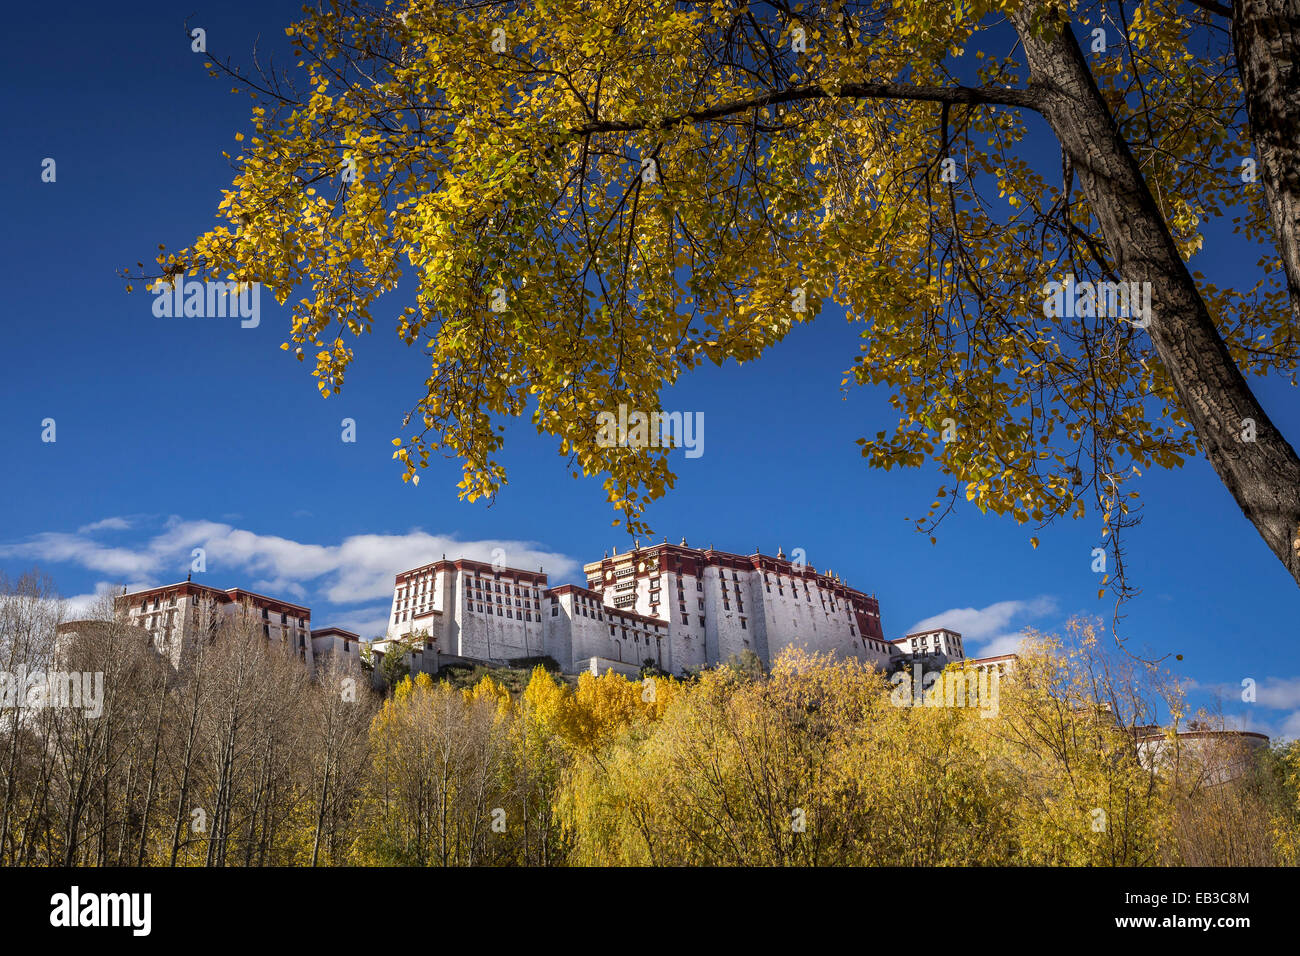 China, Tibet Autonomous Region, Potala Palace in autumn Stock Photo